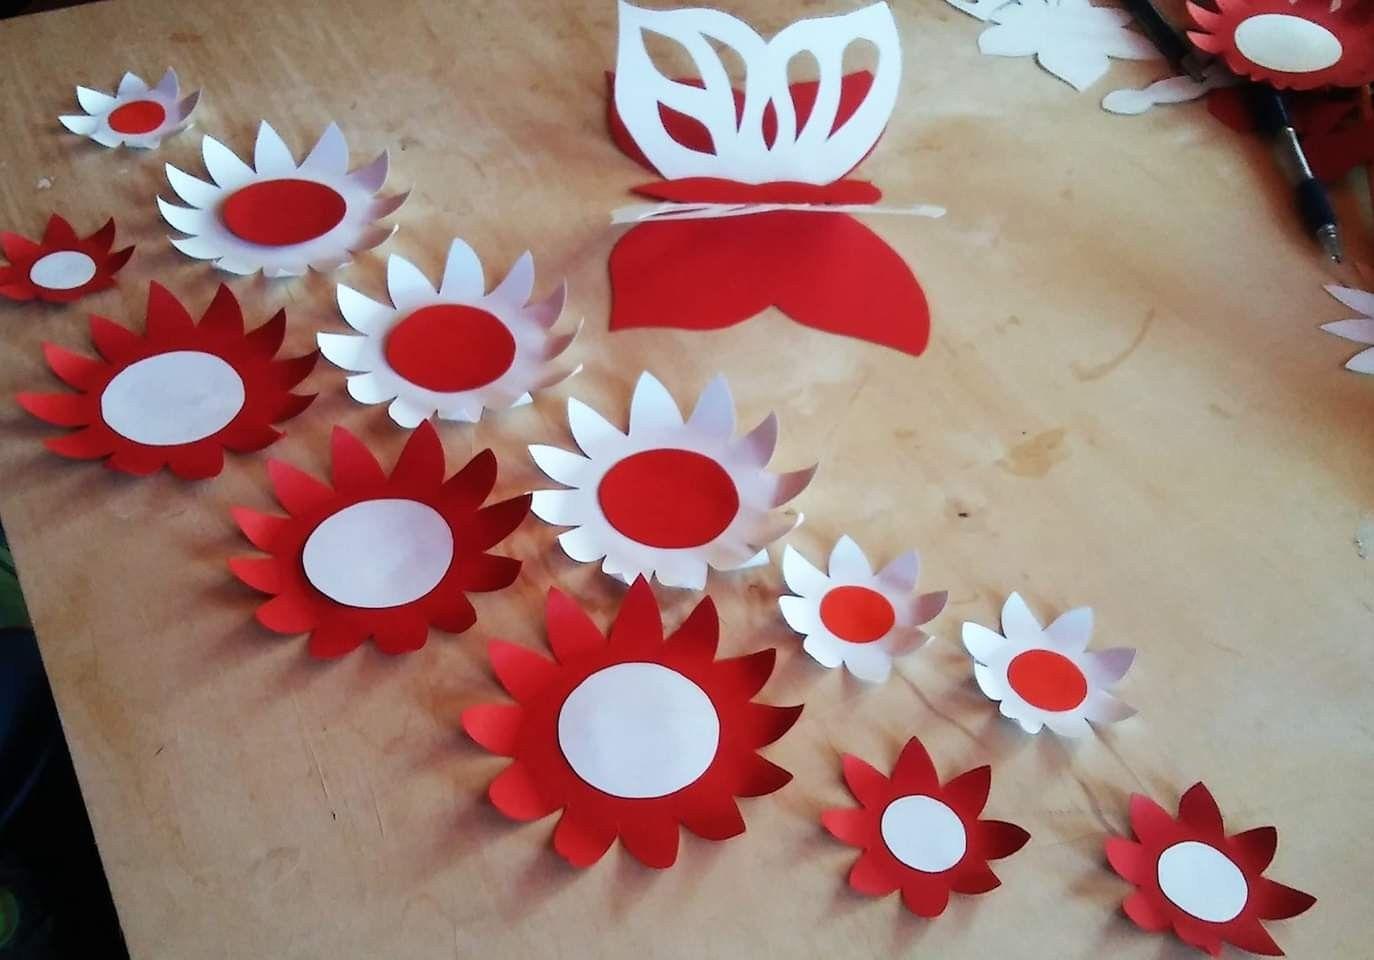 Pin By Gosiapp On Gazetki Na Tablice Preschool Crafts Craft Activities For Kids Valentine Crafts